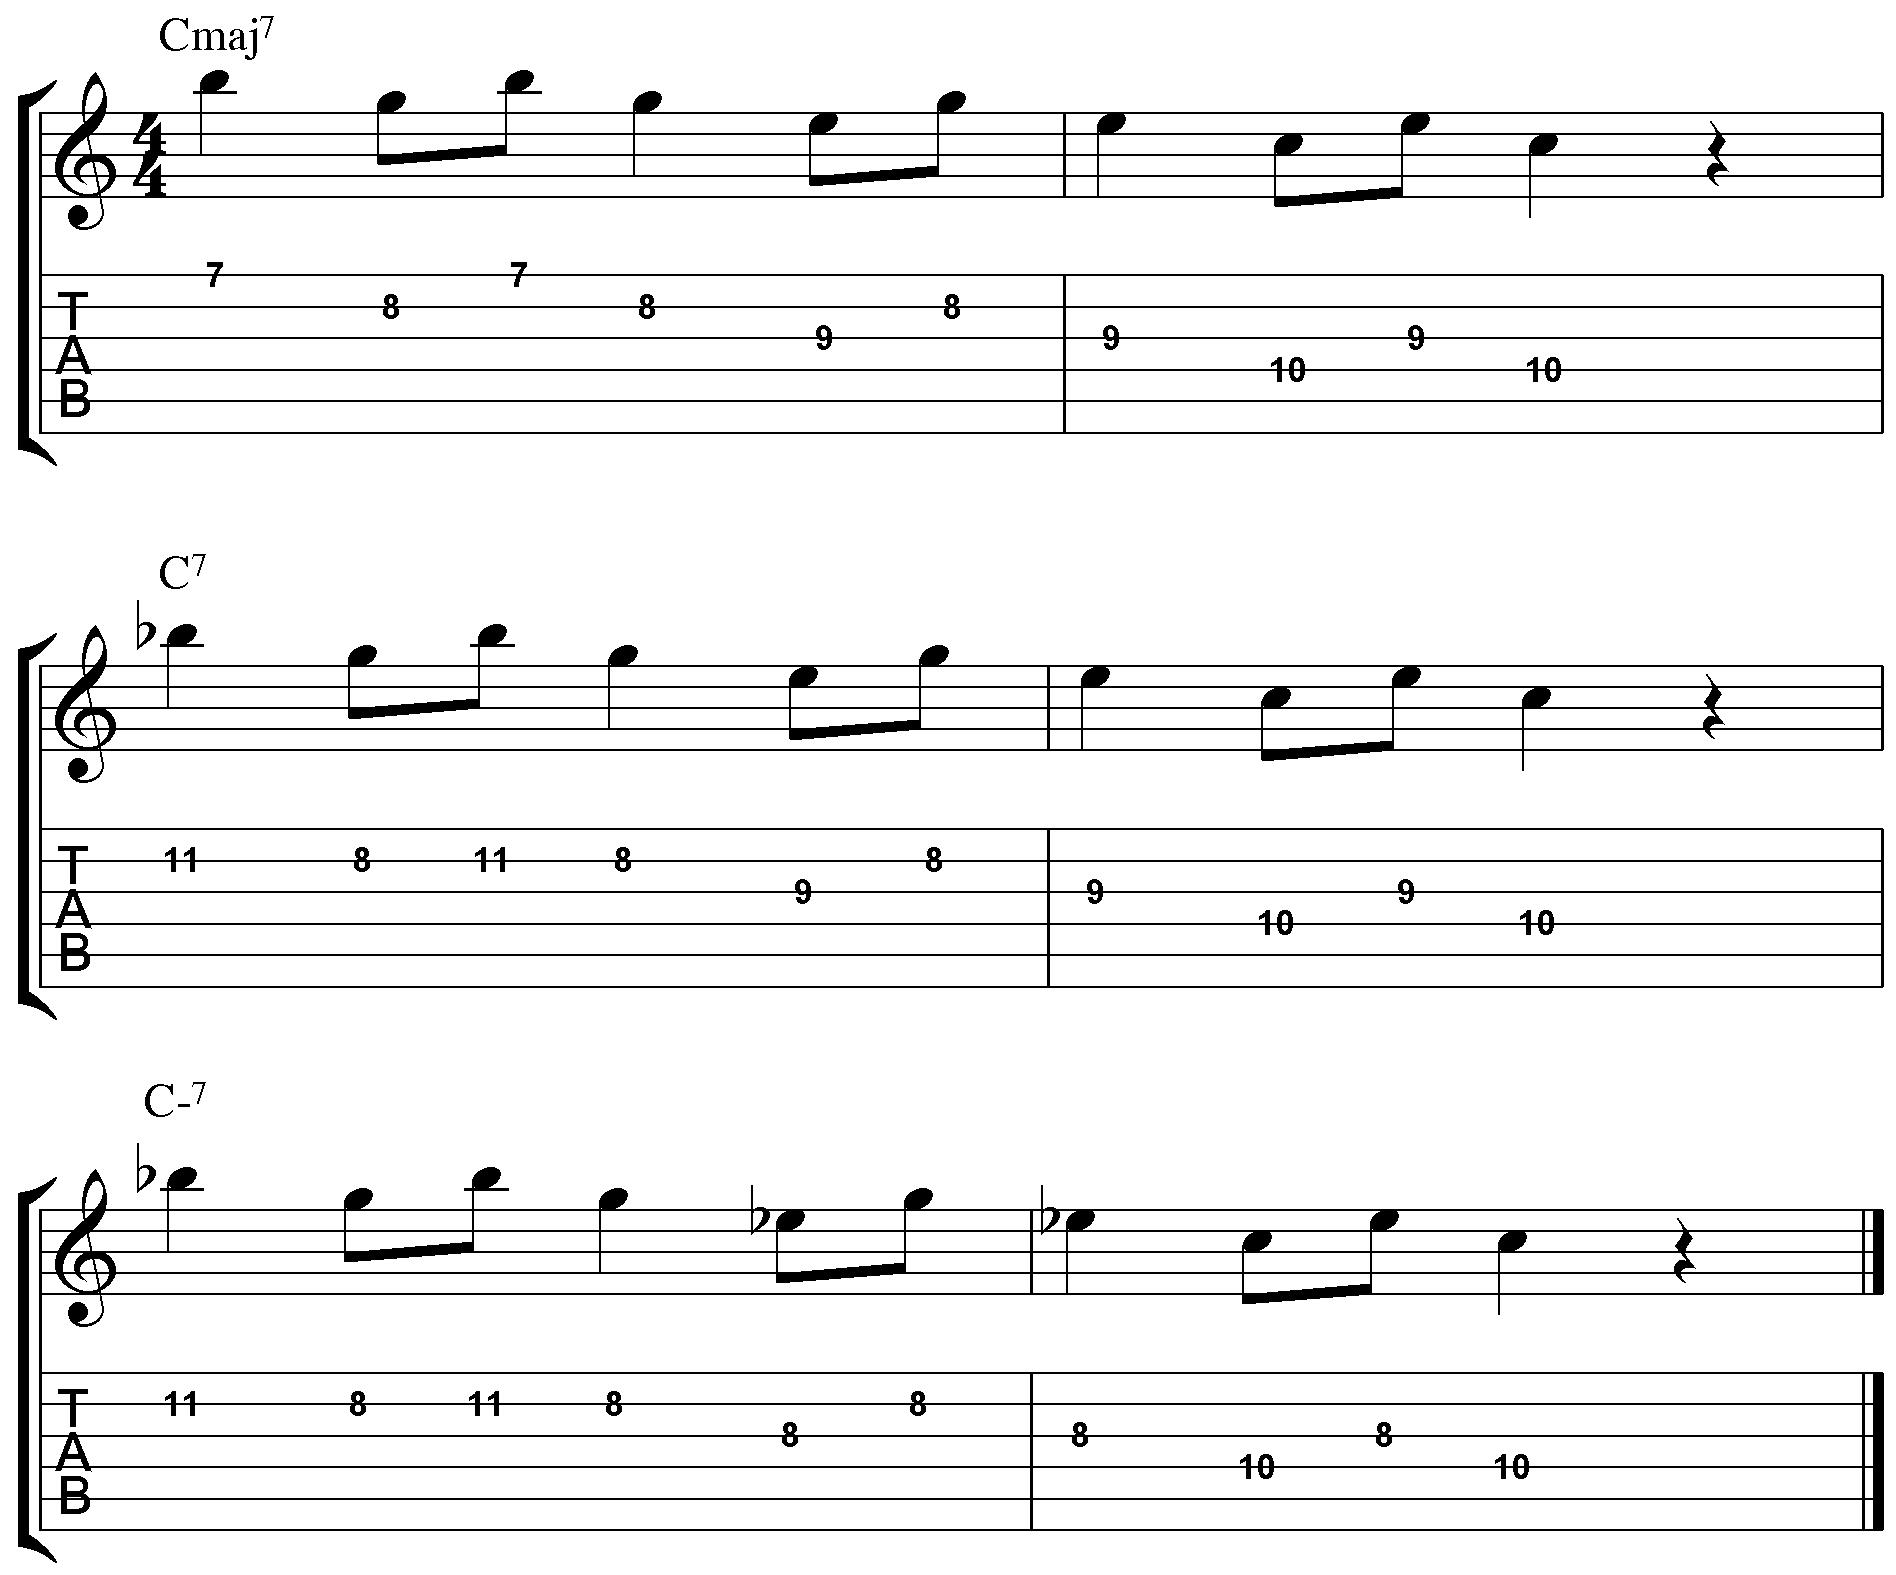 telecaster wiring diagram images seymour duncan pickup wiring diagram also remember guitar strings